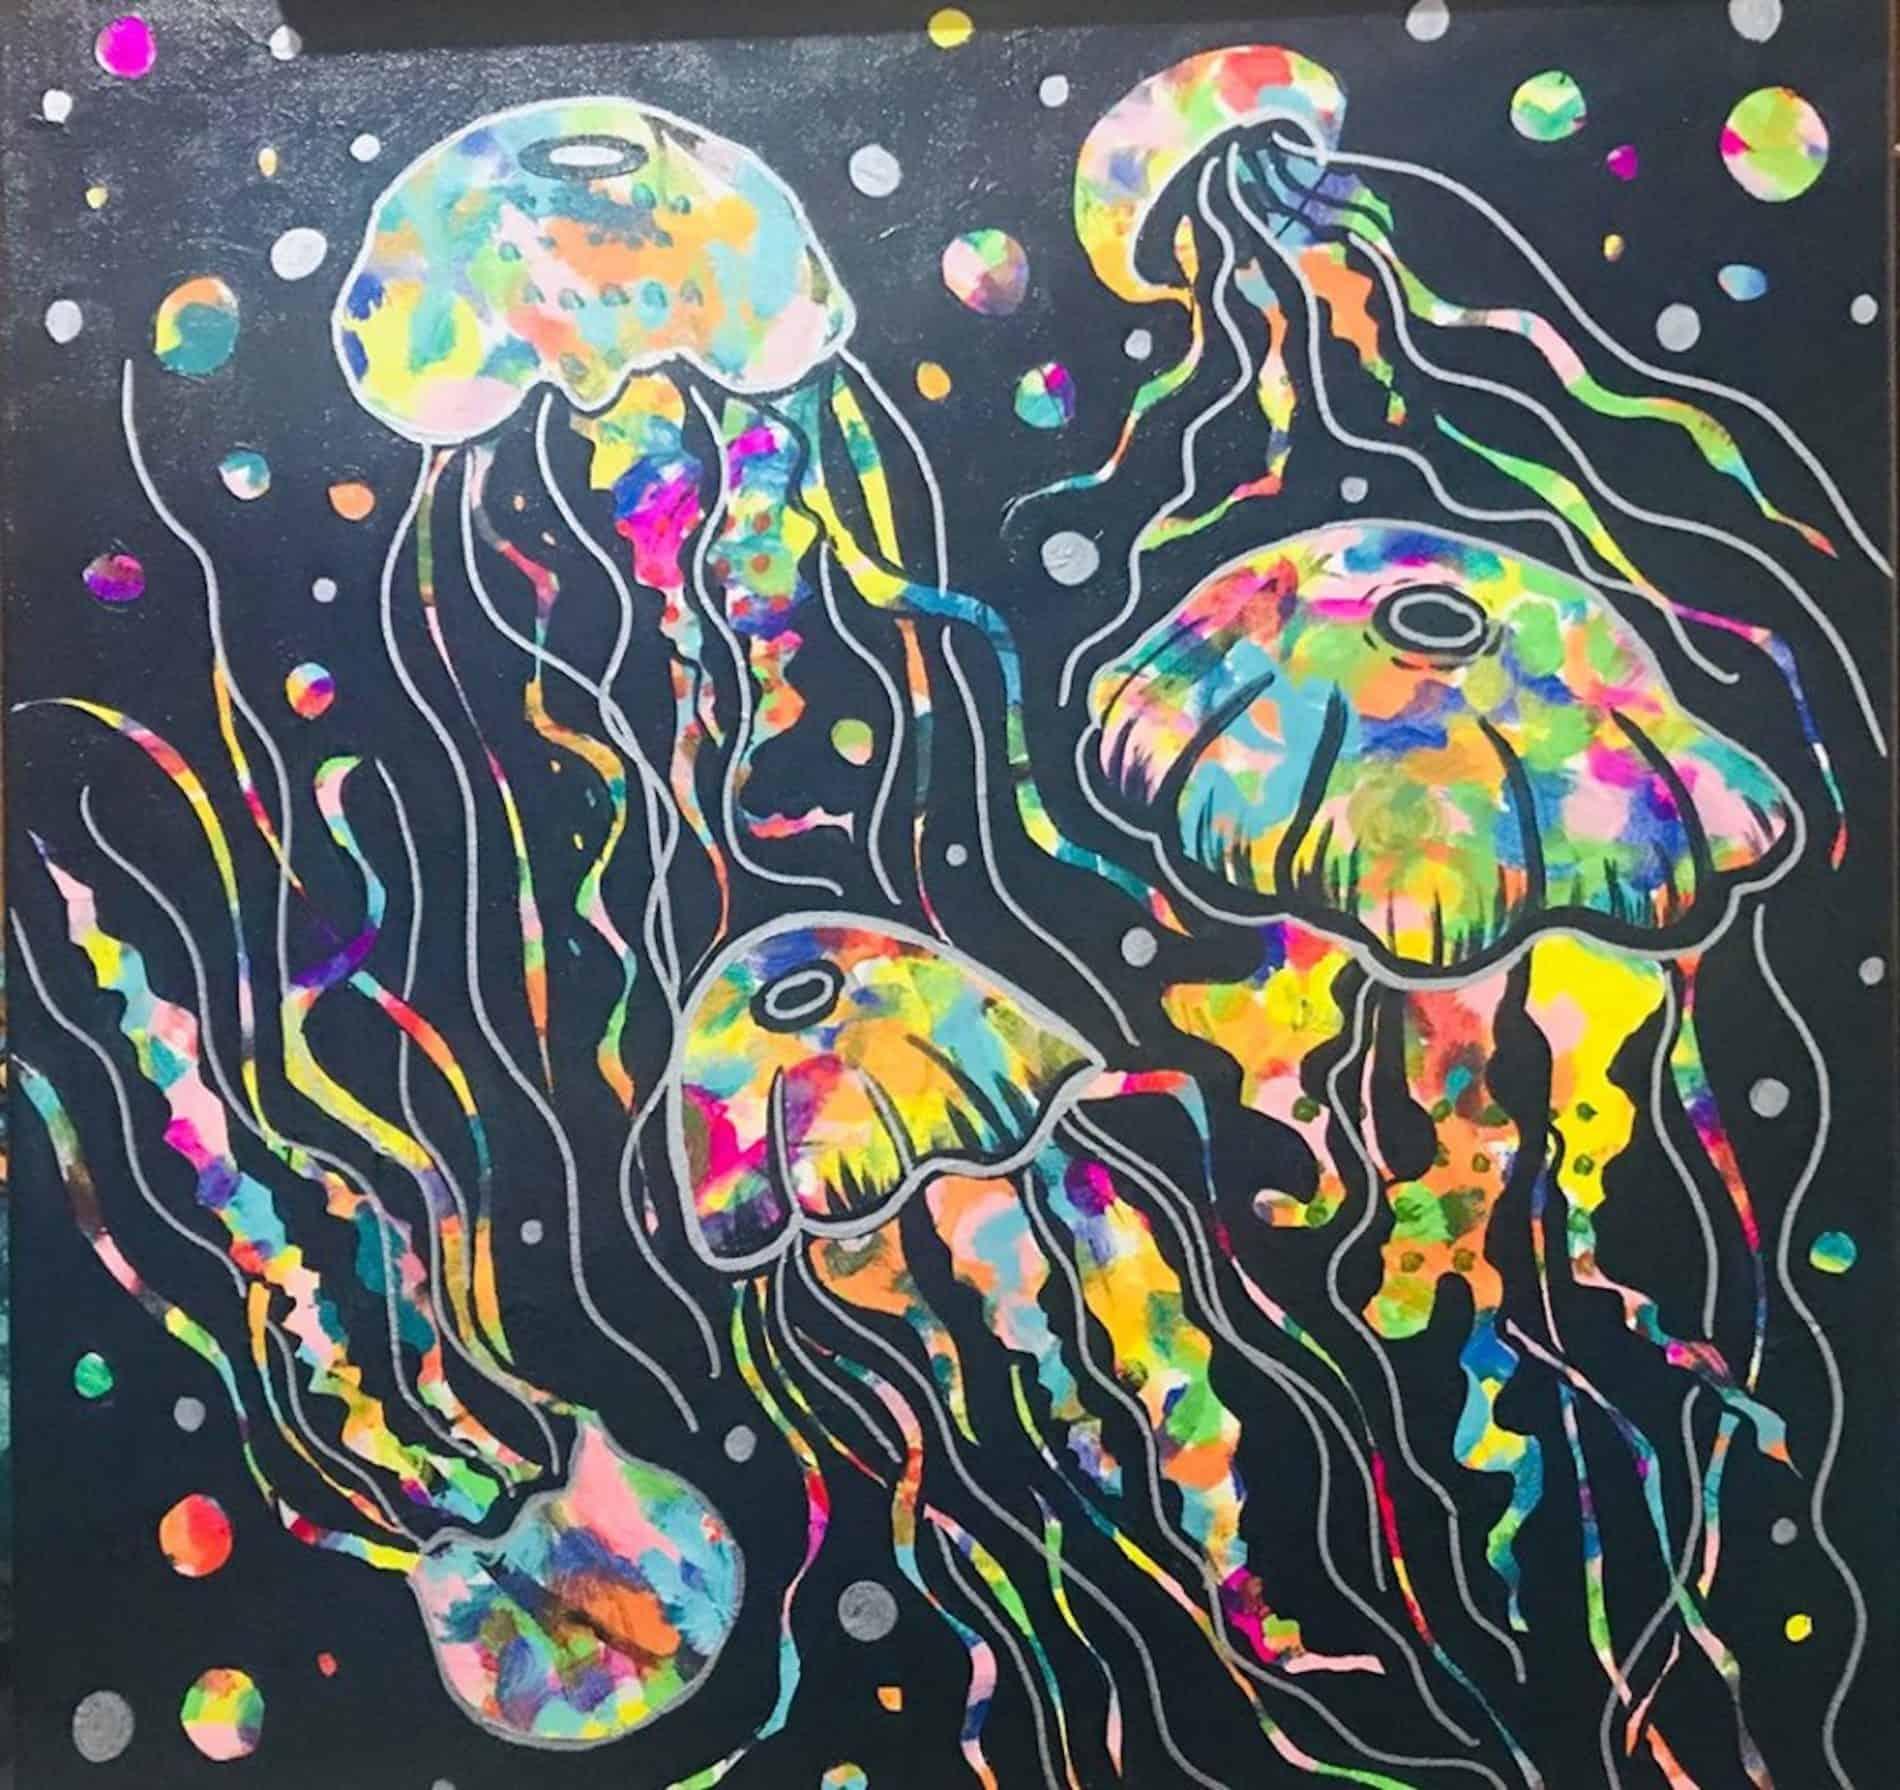 mauritius_arts_lauredy_louise-jellyfish